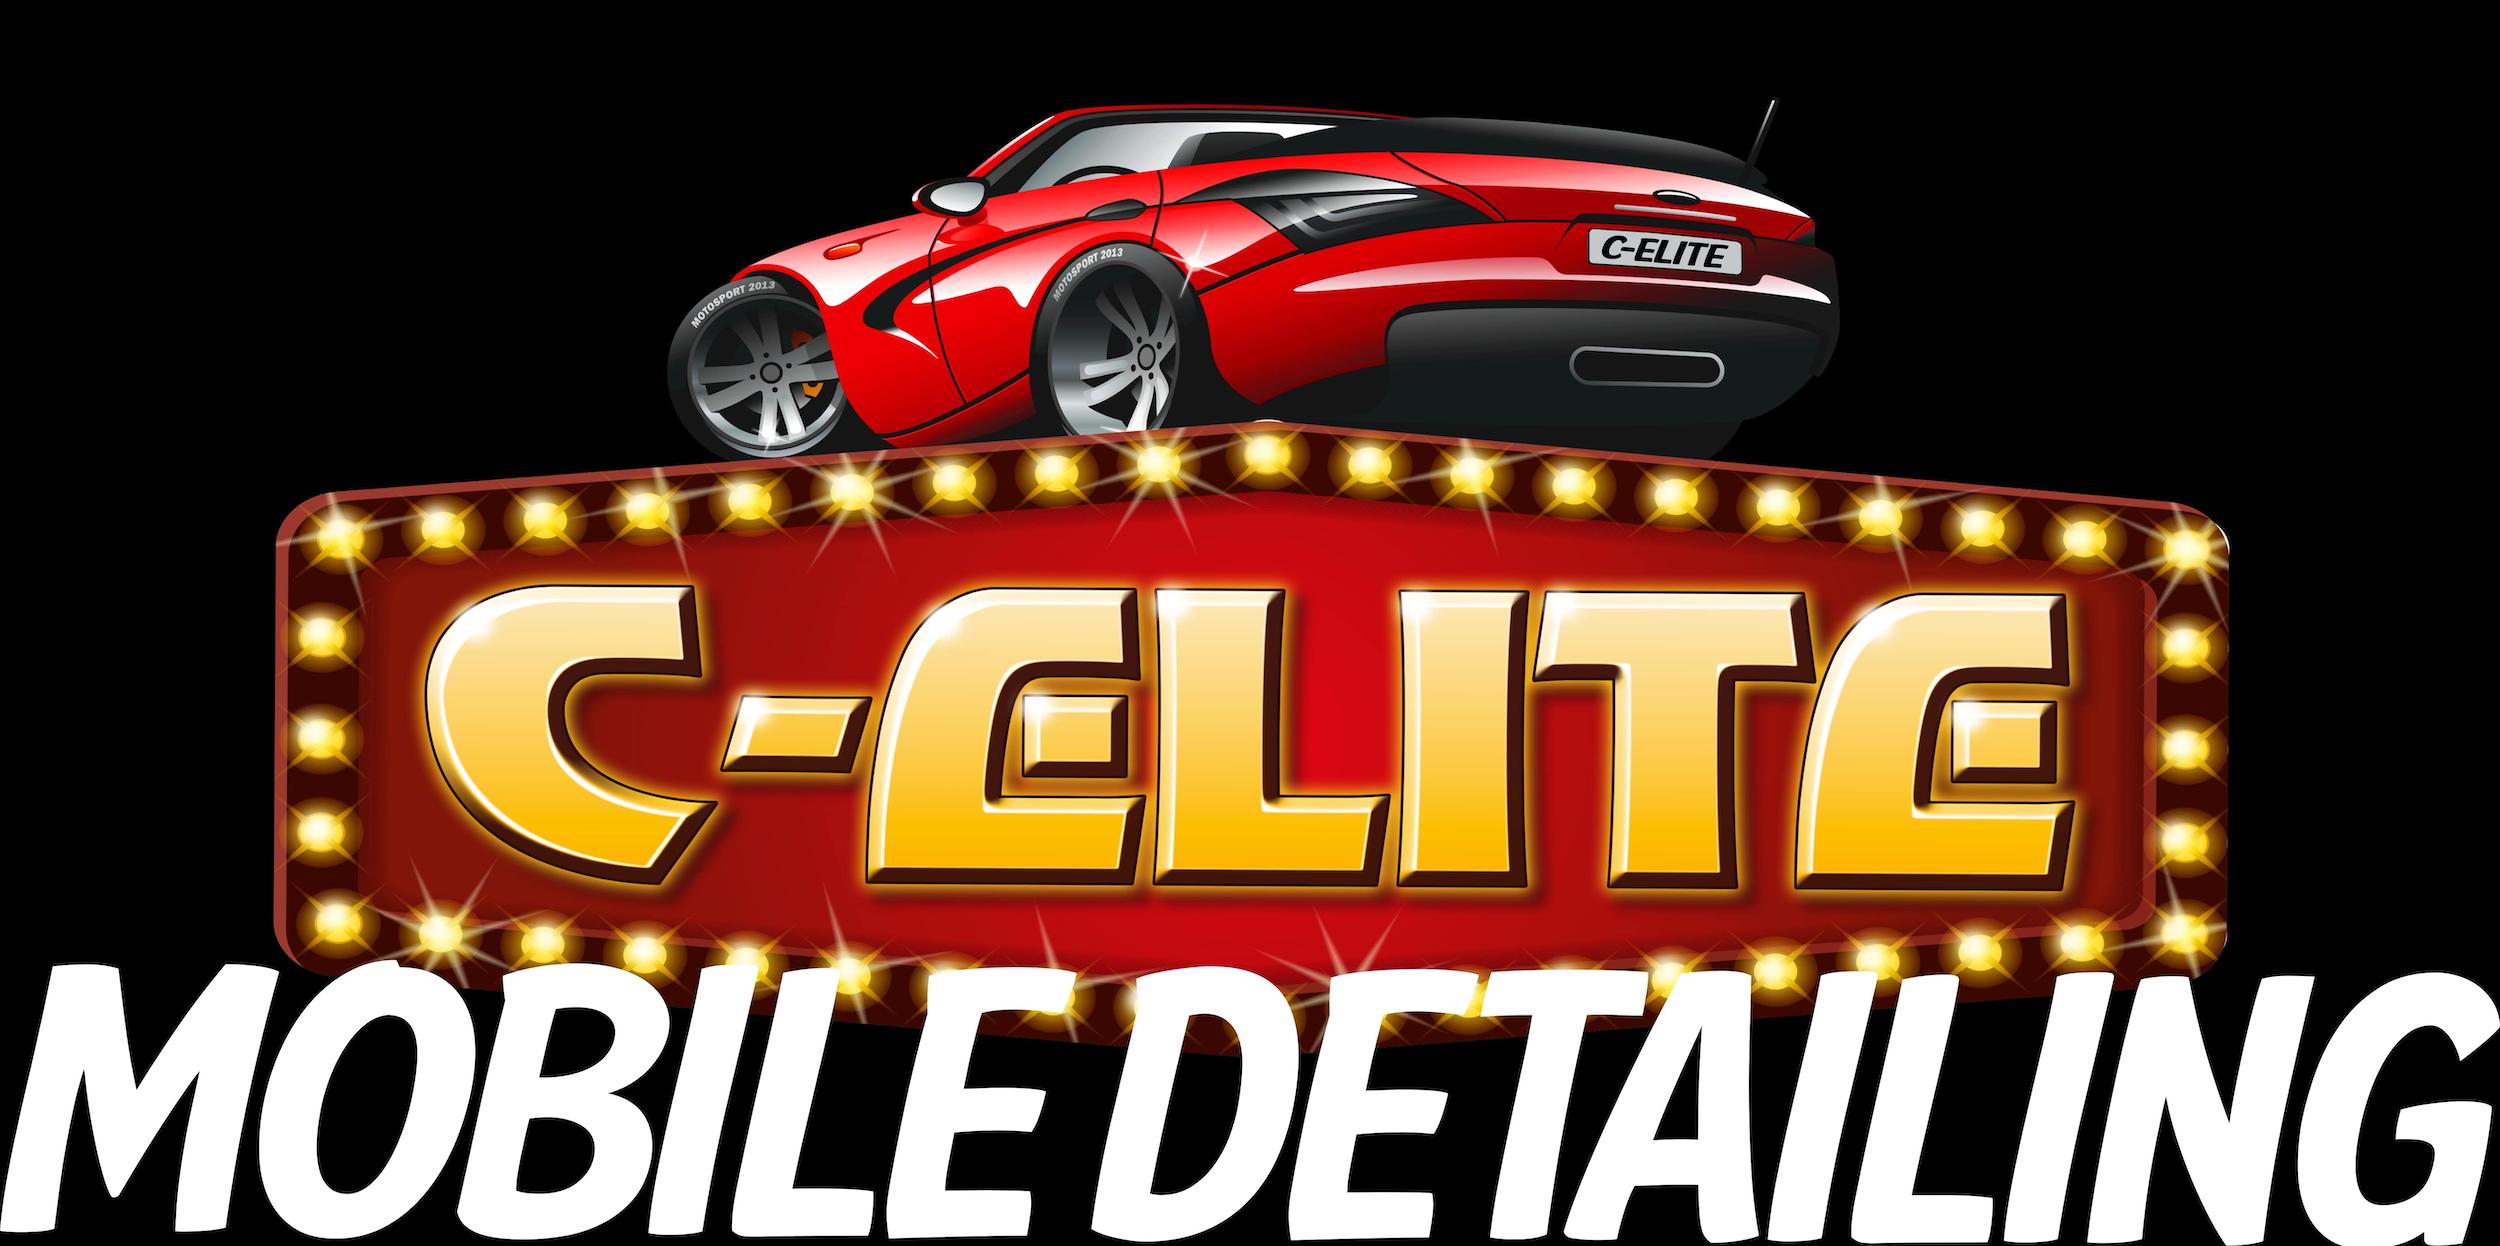 C-Elite Mobil Detailing